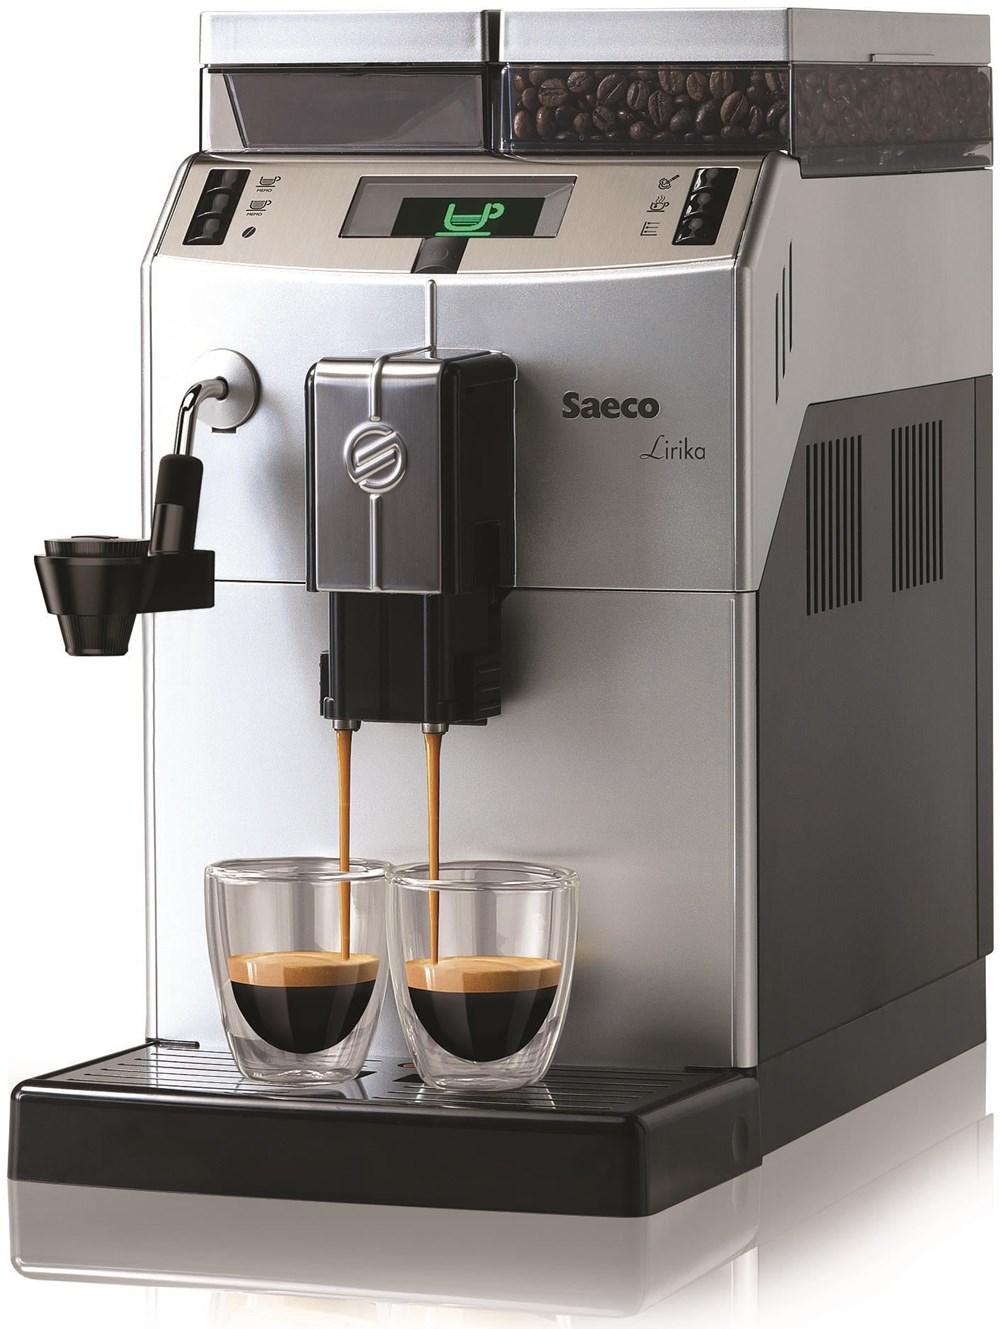 Philips Coffee Maker Bean To Cup : Philips Saeco Lirika Macchiato - Bean-to-Cup Coffee Machines - computeruniverse